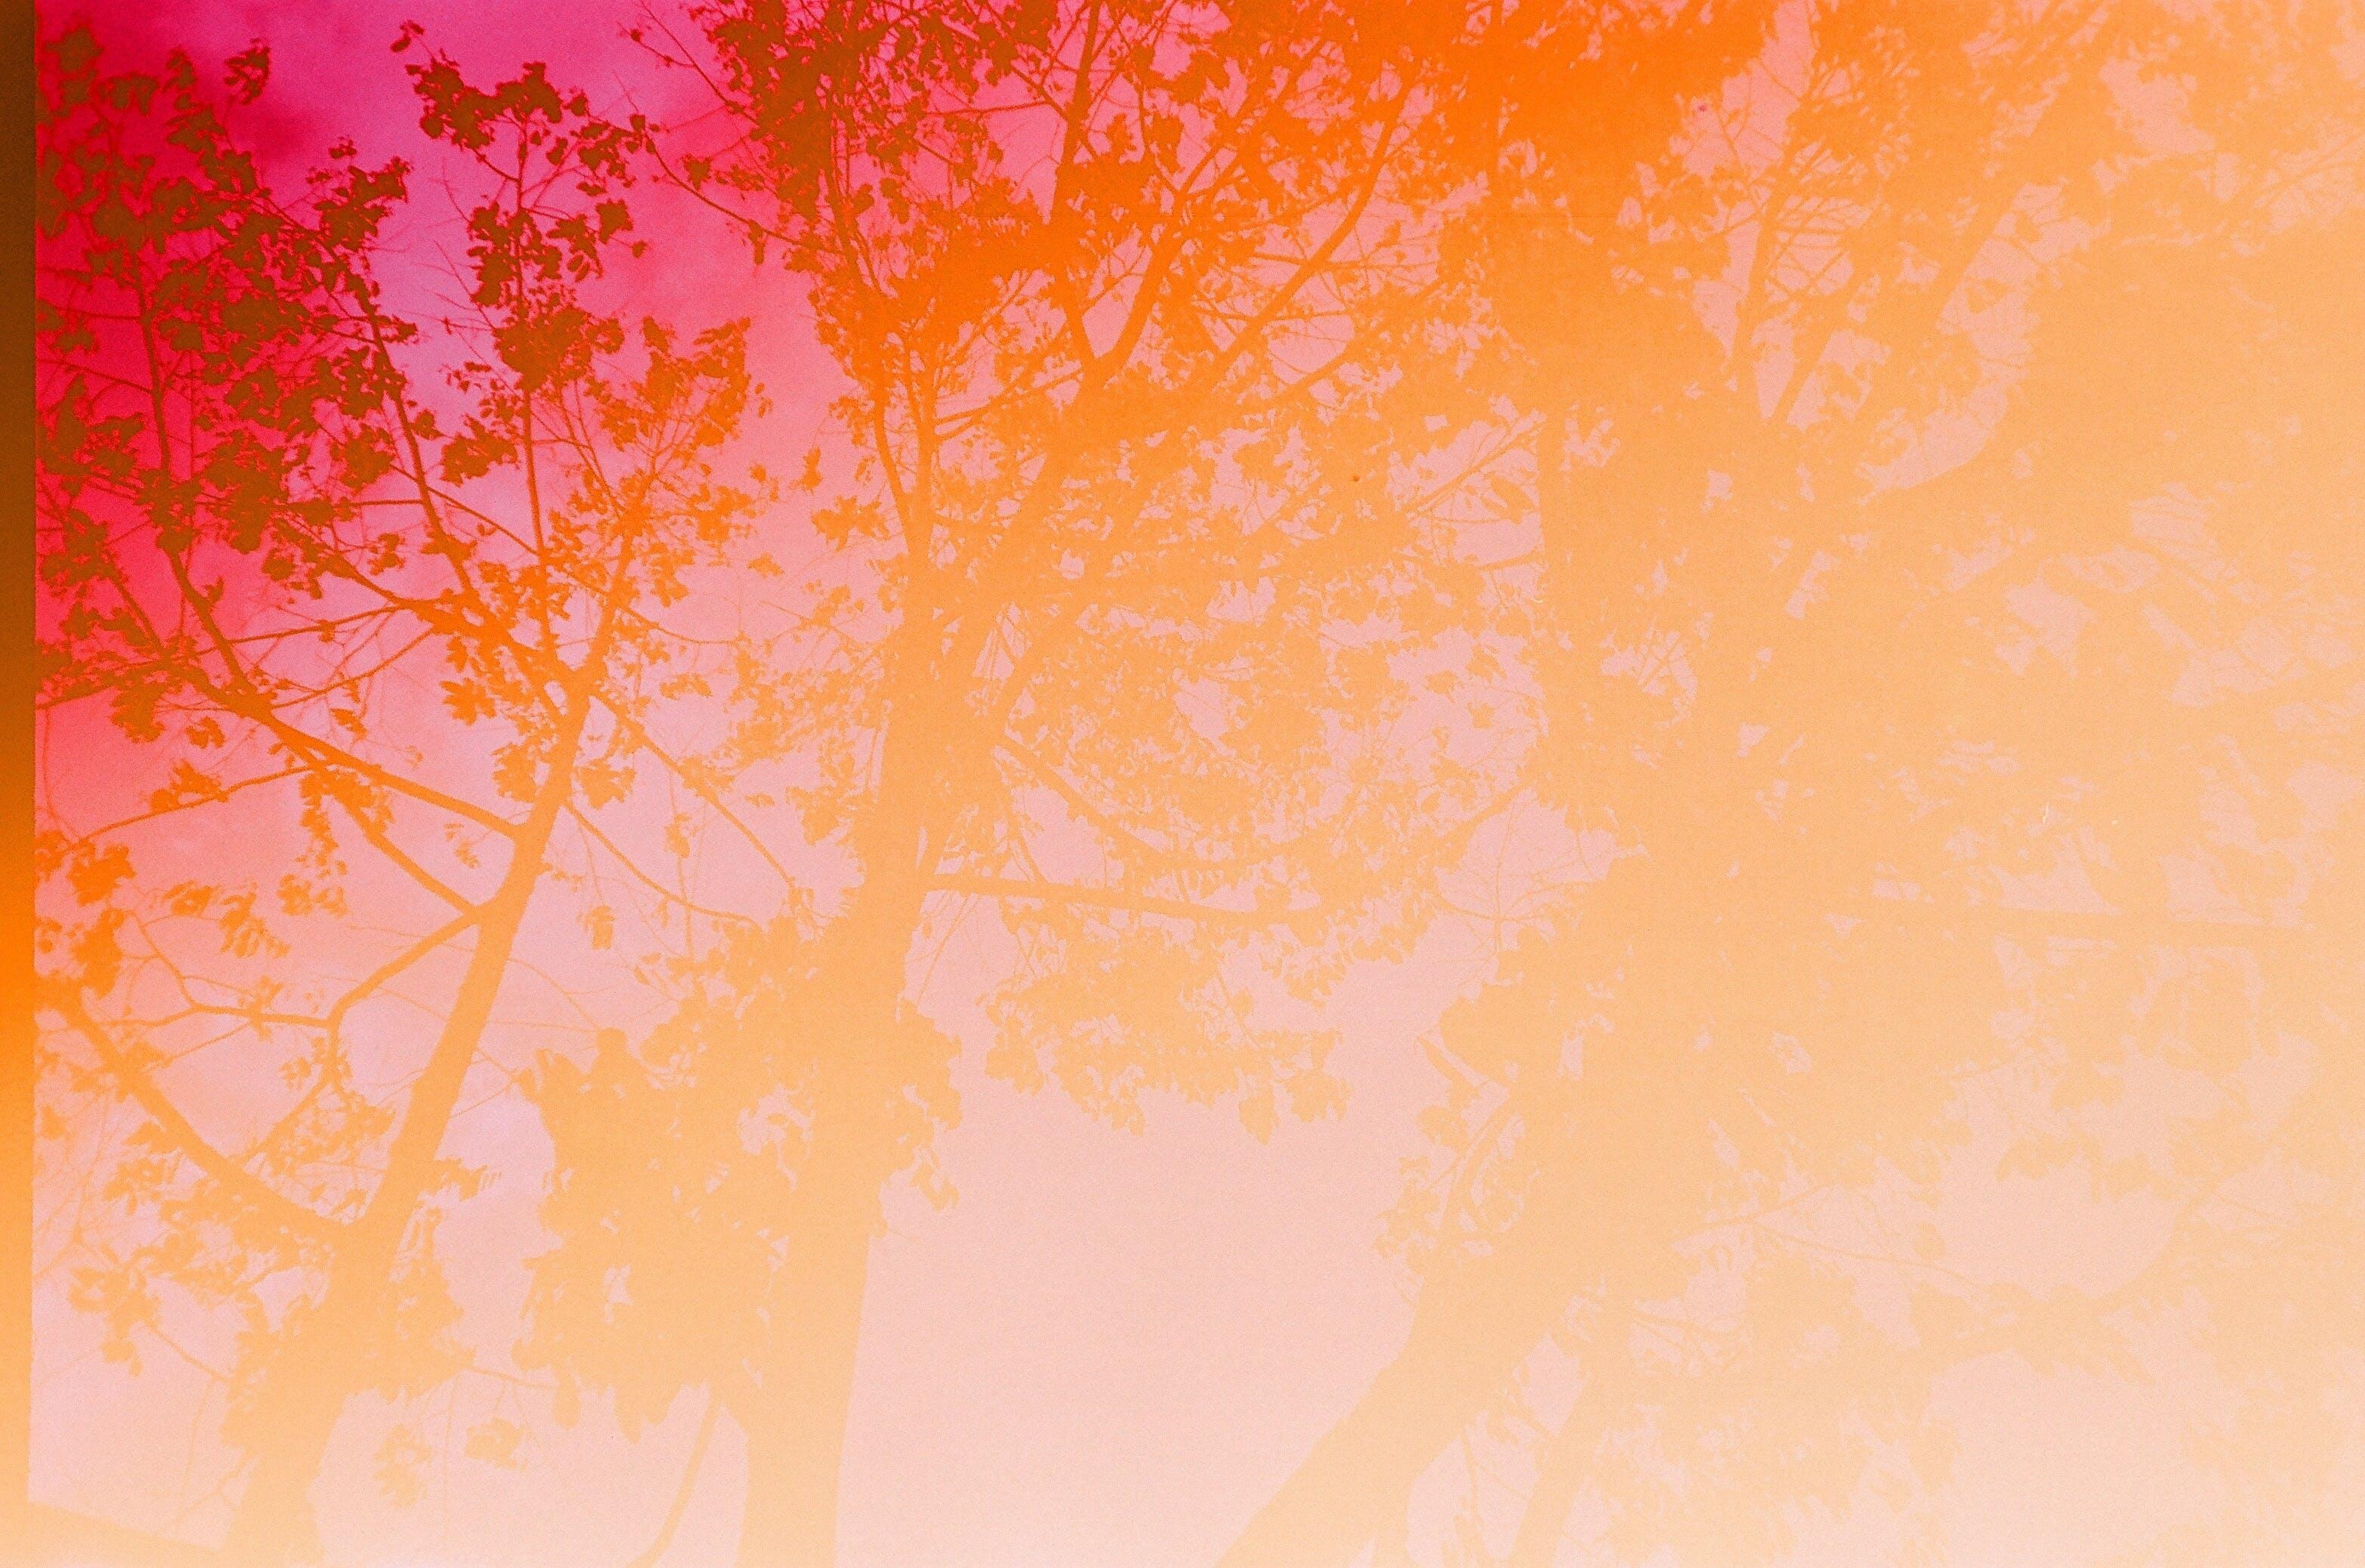 Three Leafed Trees at Daytime